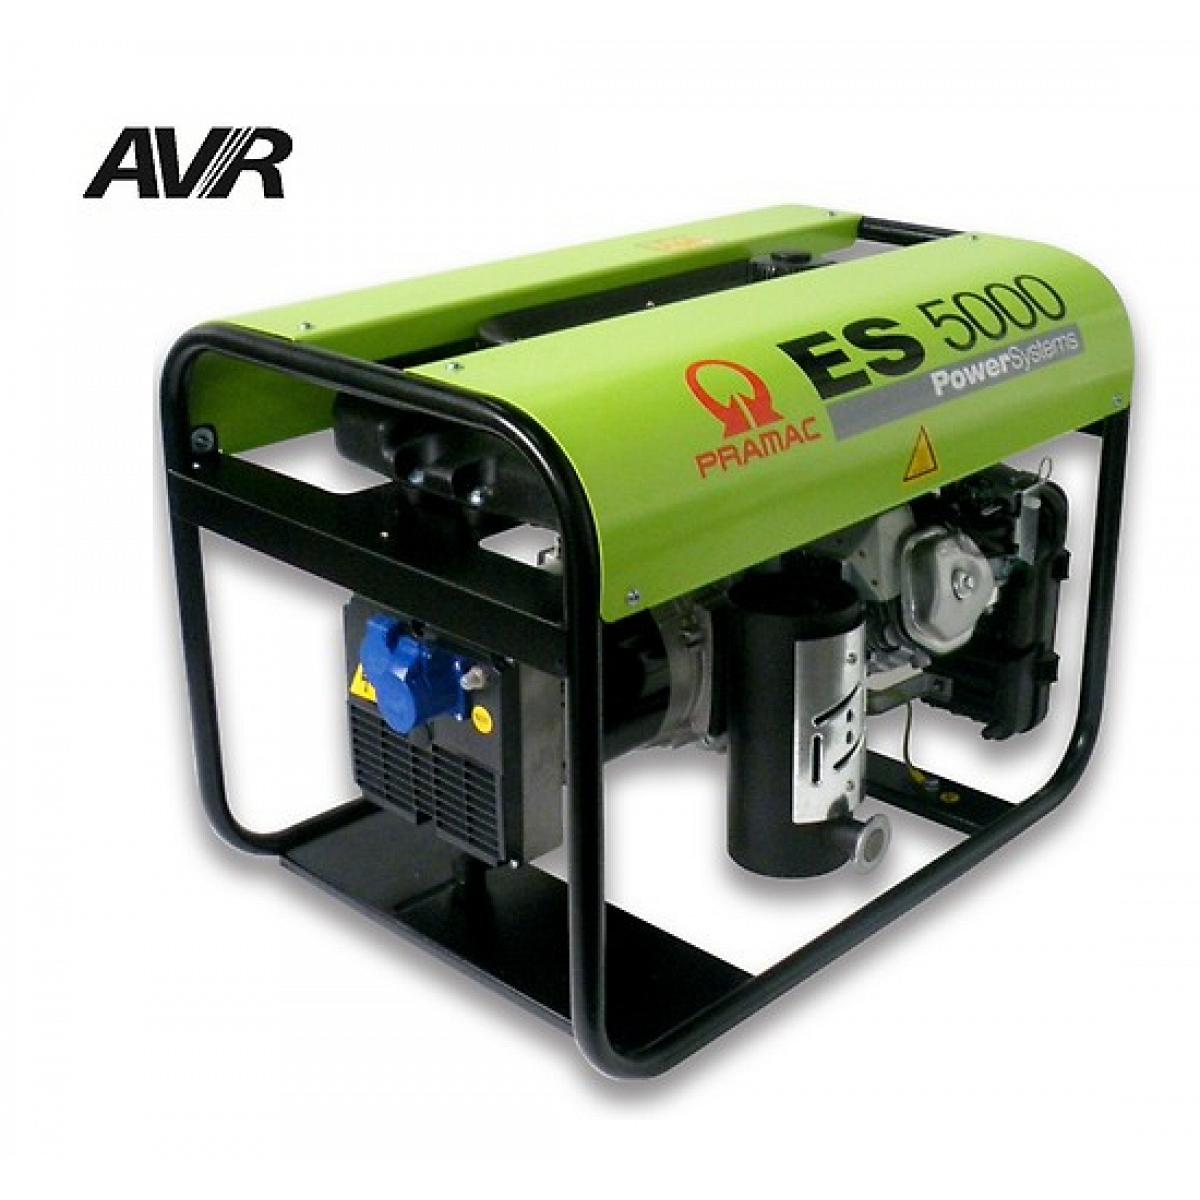 Generatore monofase pramac es5000 avr motore honda gx270 for Piscine b24